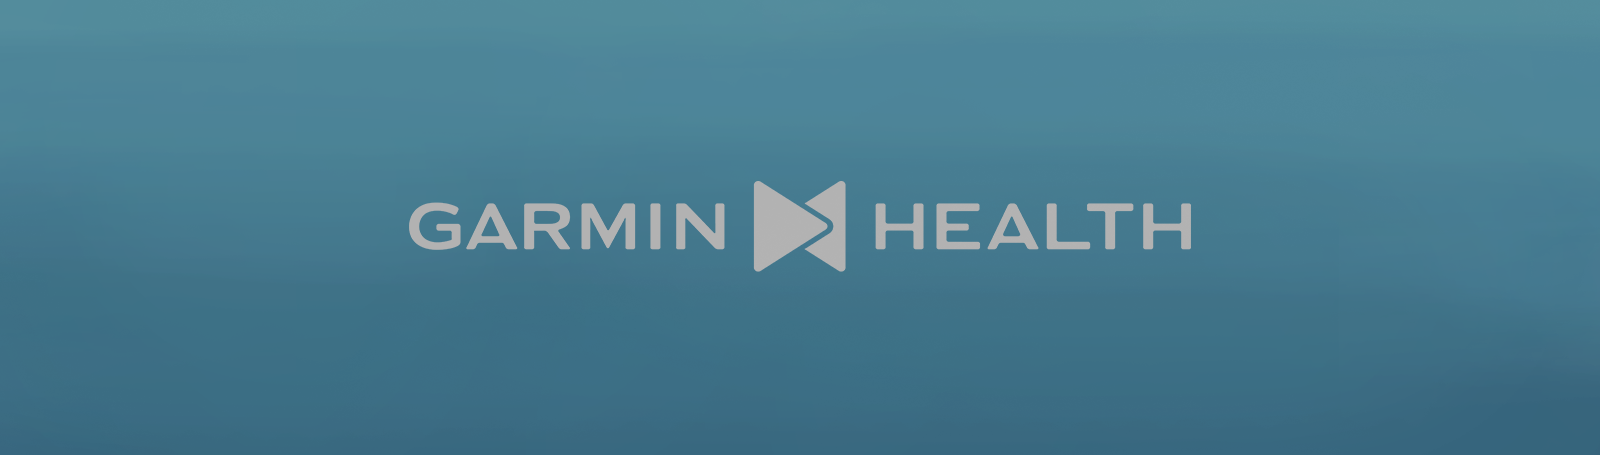 About Garmin Health